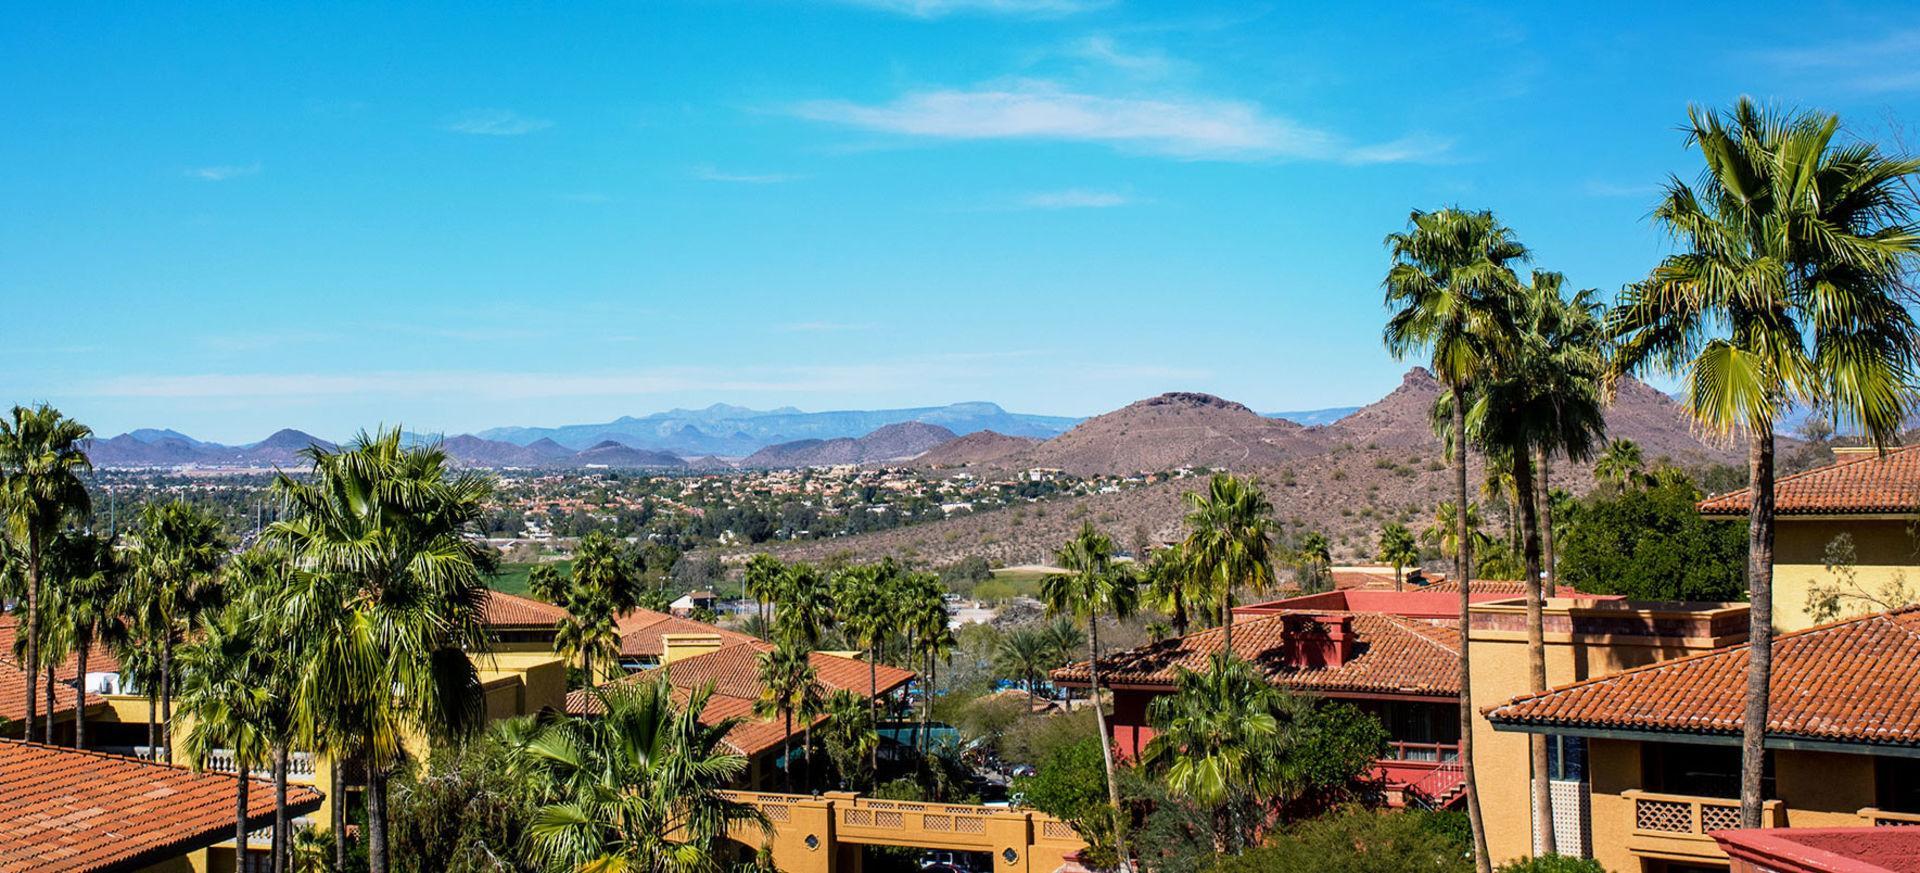 Pointe Hilton at Tapatio Cliffs, Arizona - Book Golf Holidays & Flights